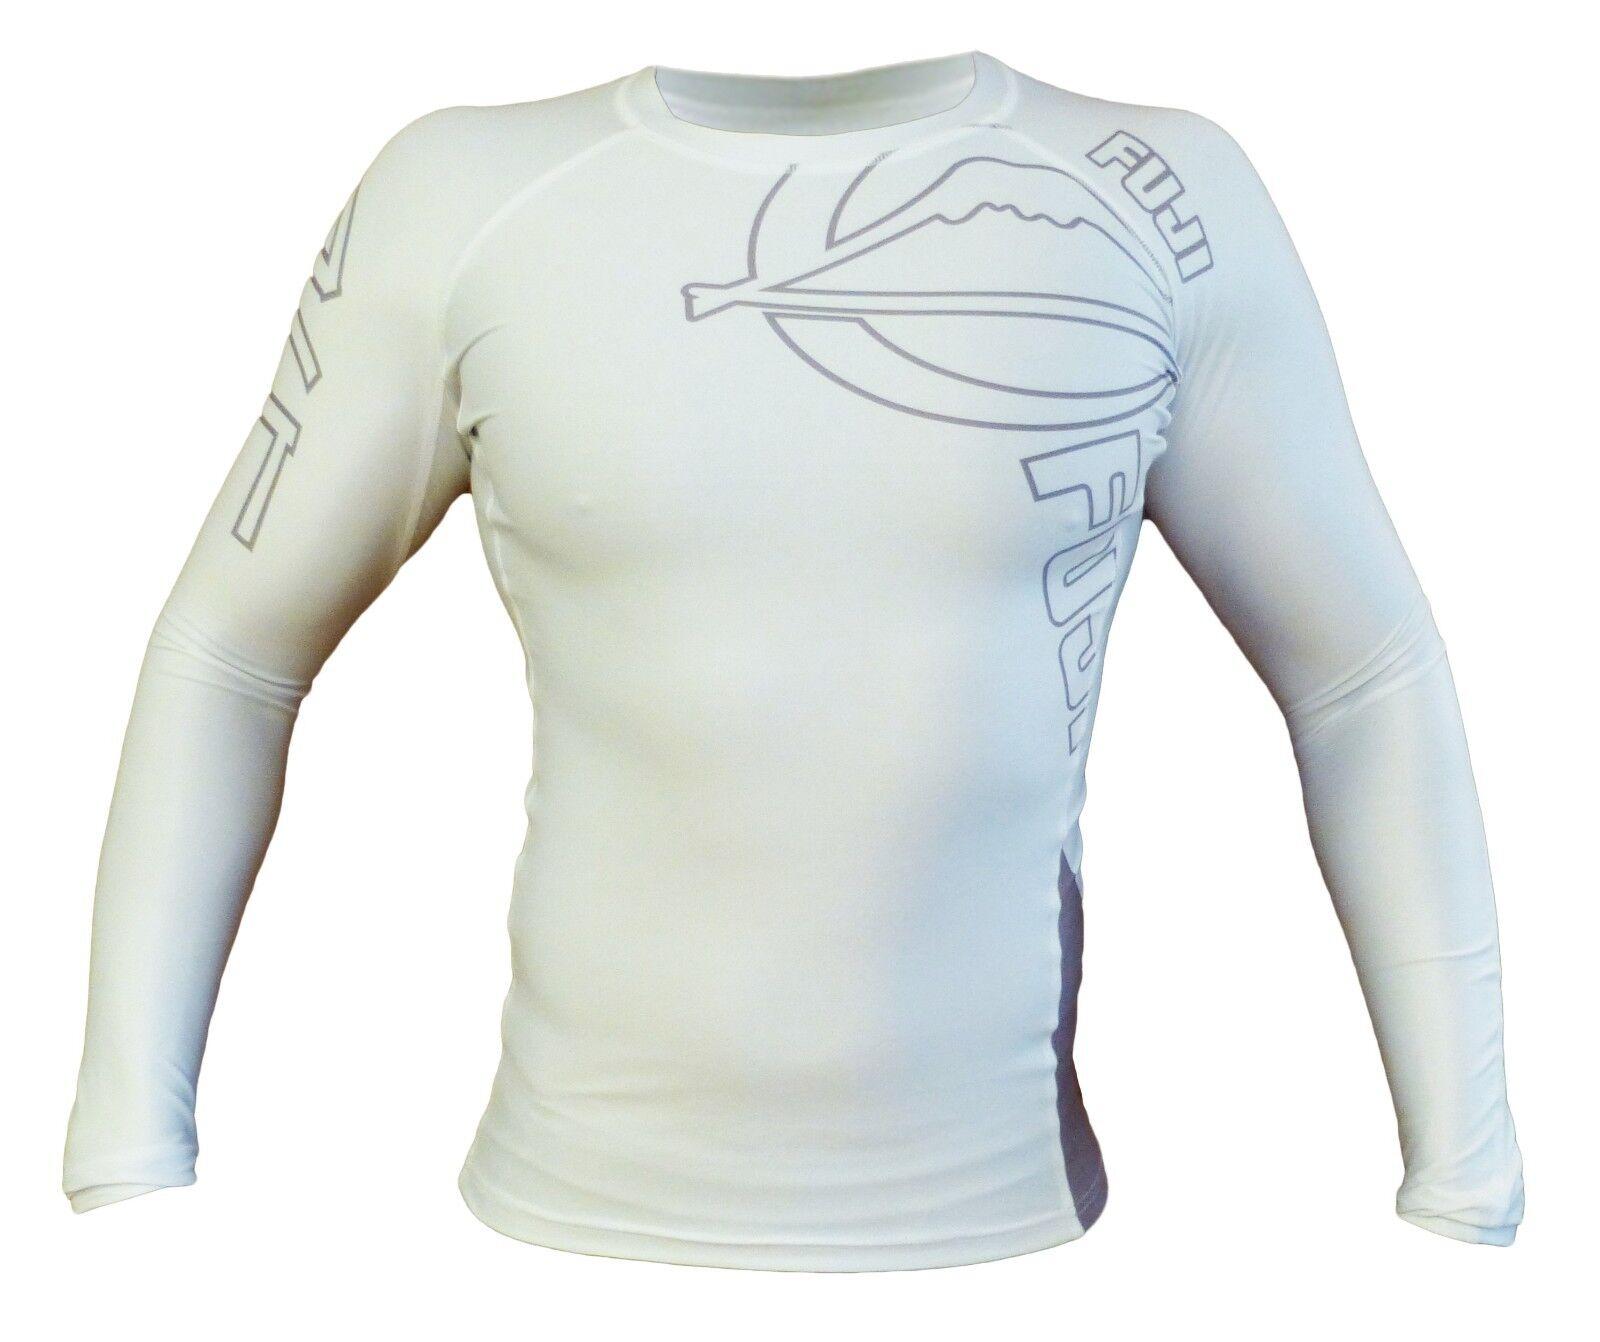 New Fuji Ingreened MMA BJJ Jiu Jitsu LongSleeve Long Sleeve LS Rashguard - White